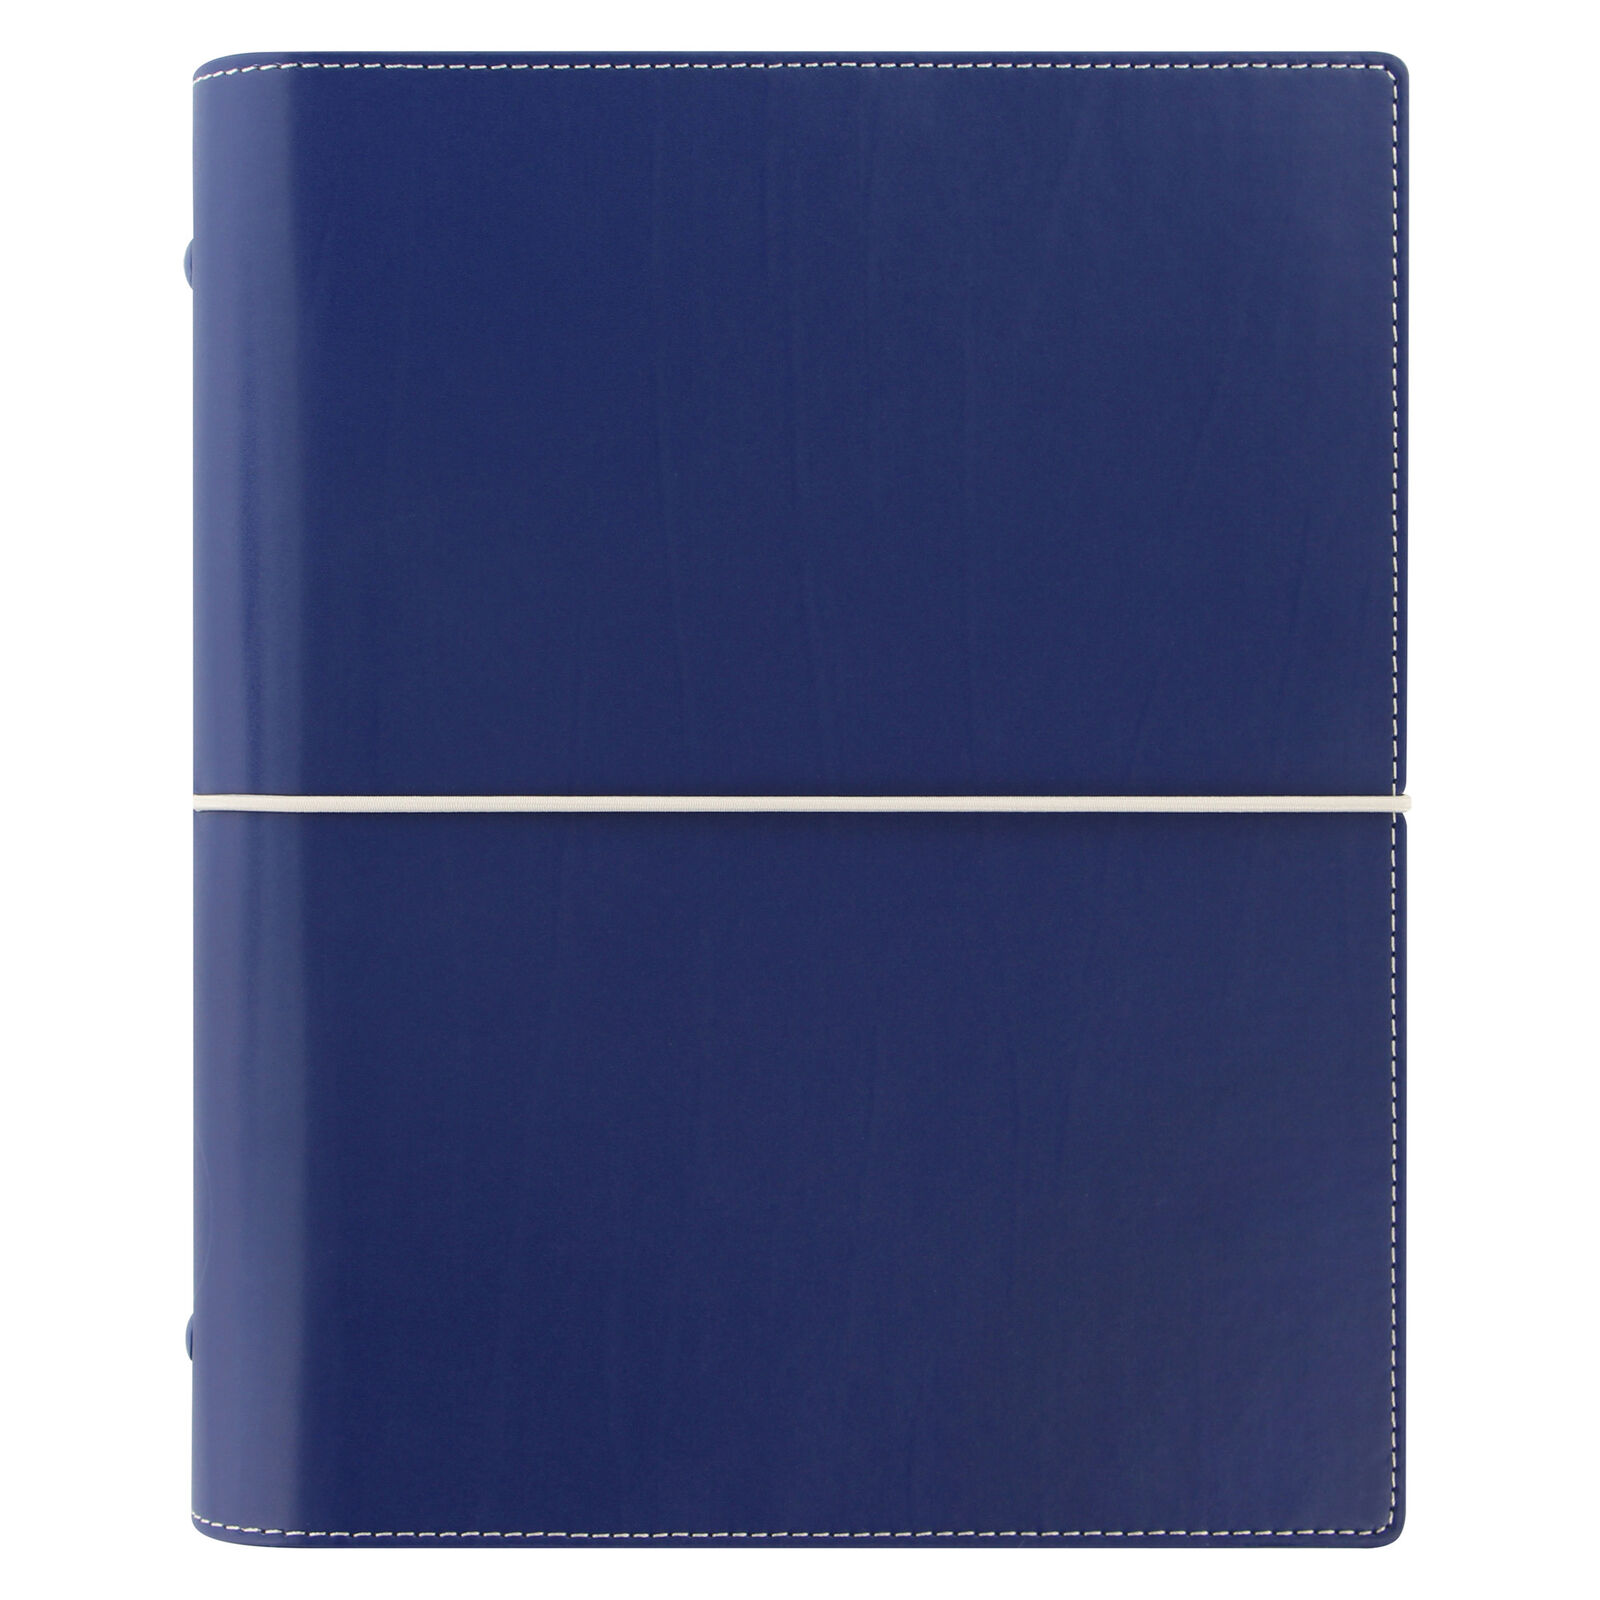 Filofax - A5 Domino Marine Tagebuch Organizer   Kaufen